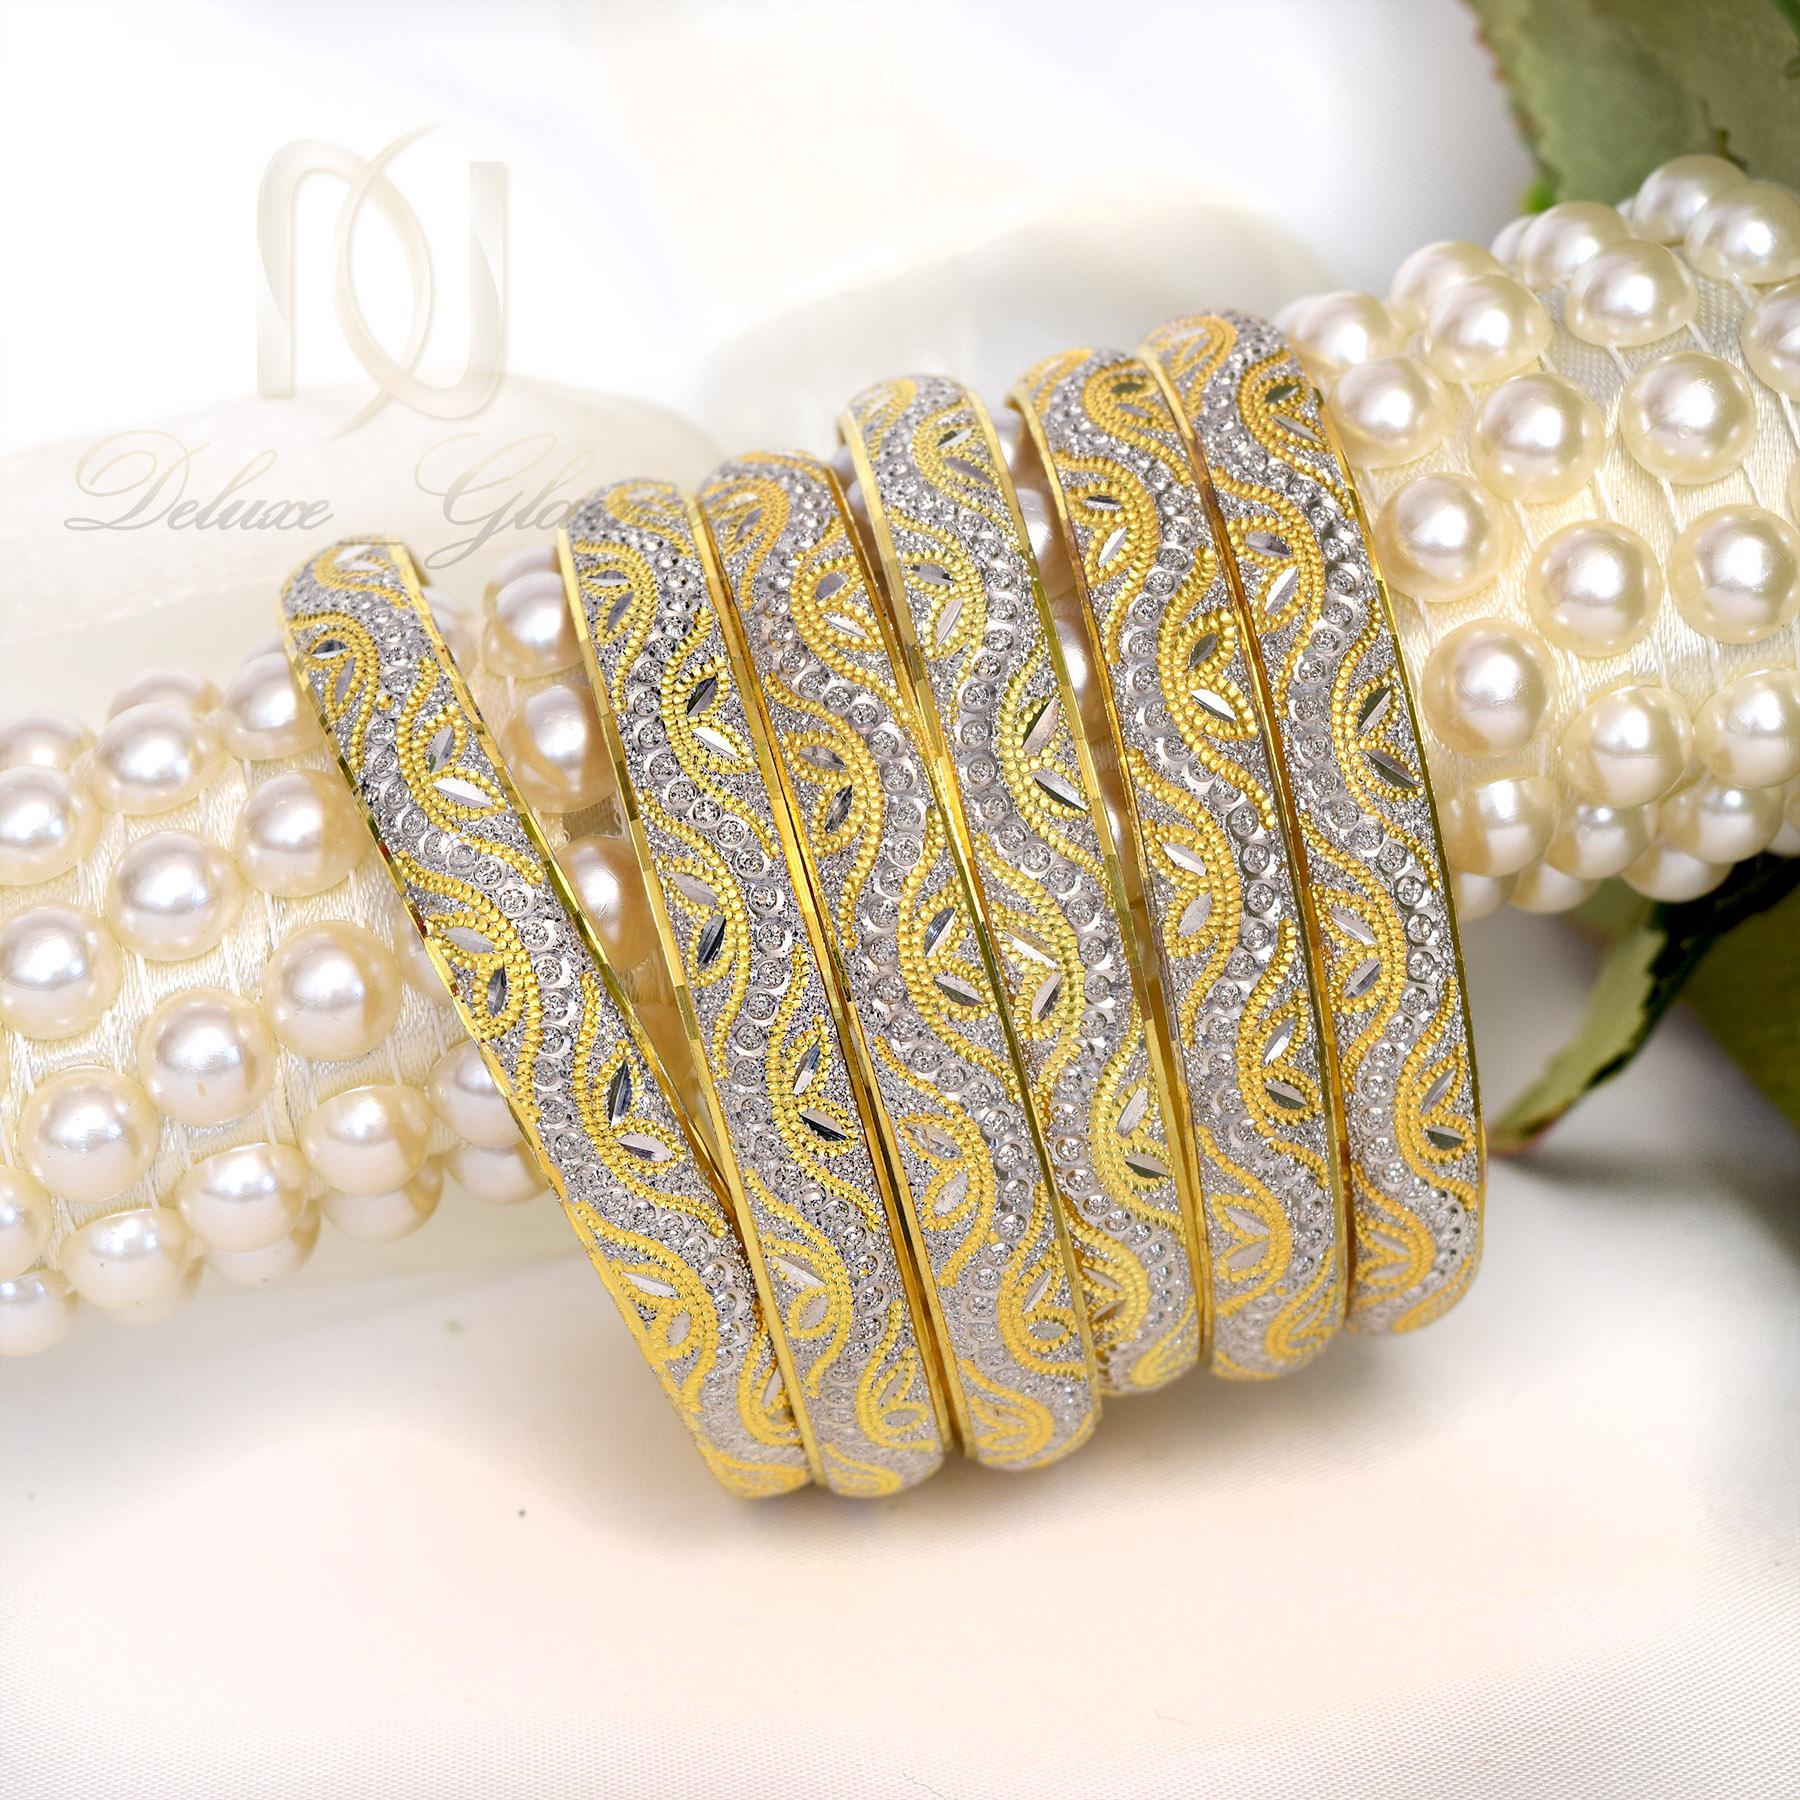 النگو نقره زنانه تراش با طرح نگین و روکش آب طلا AL-N102